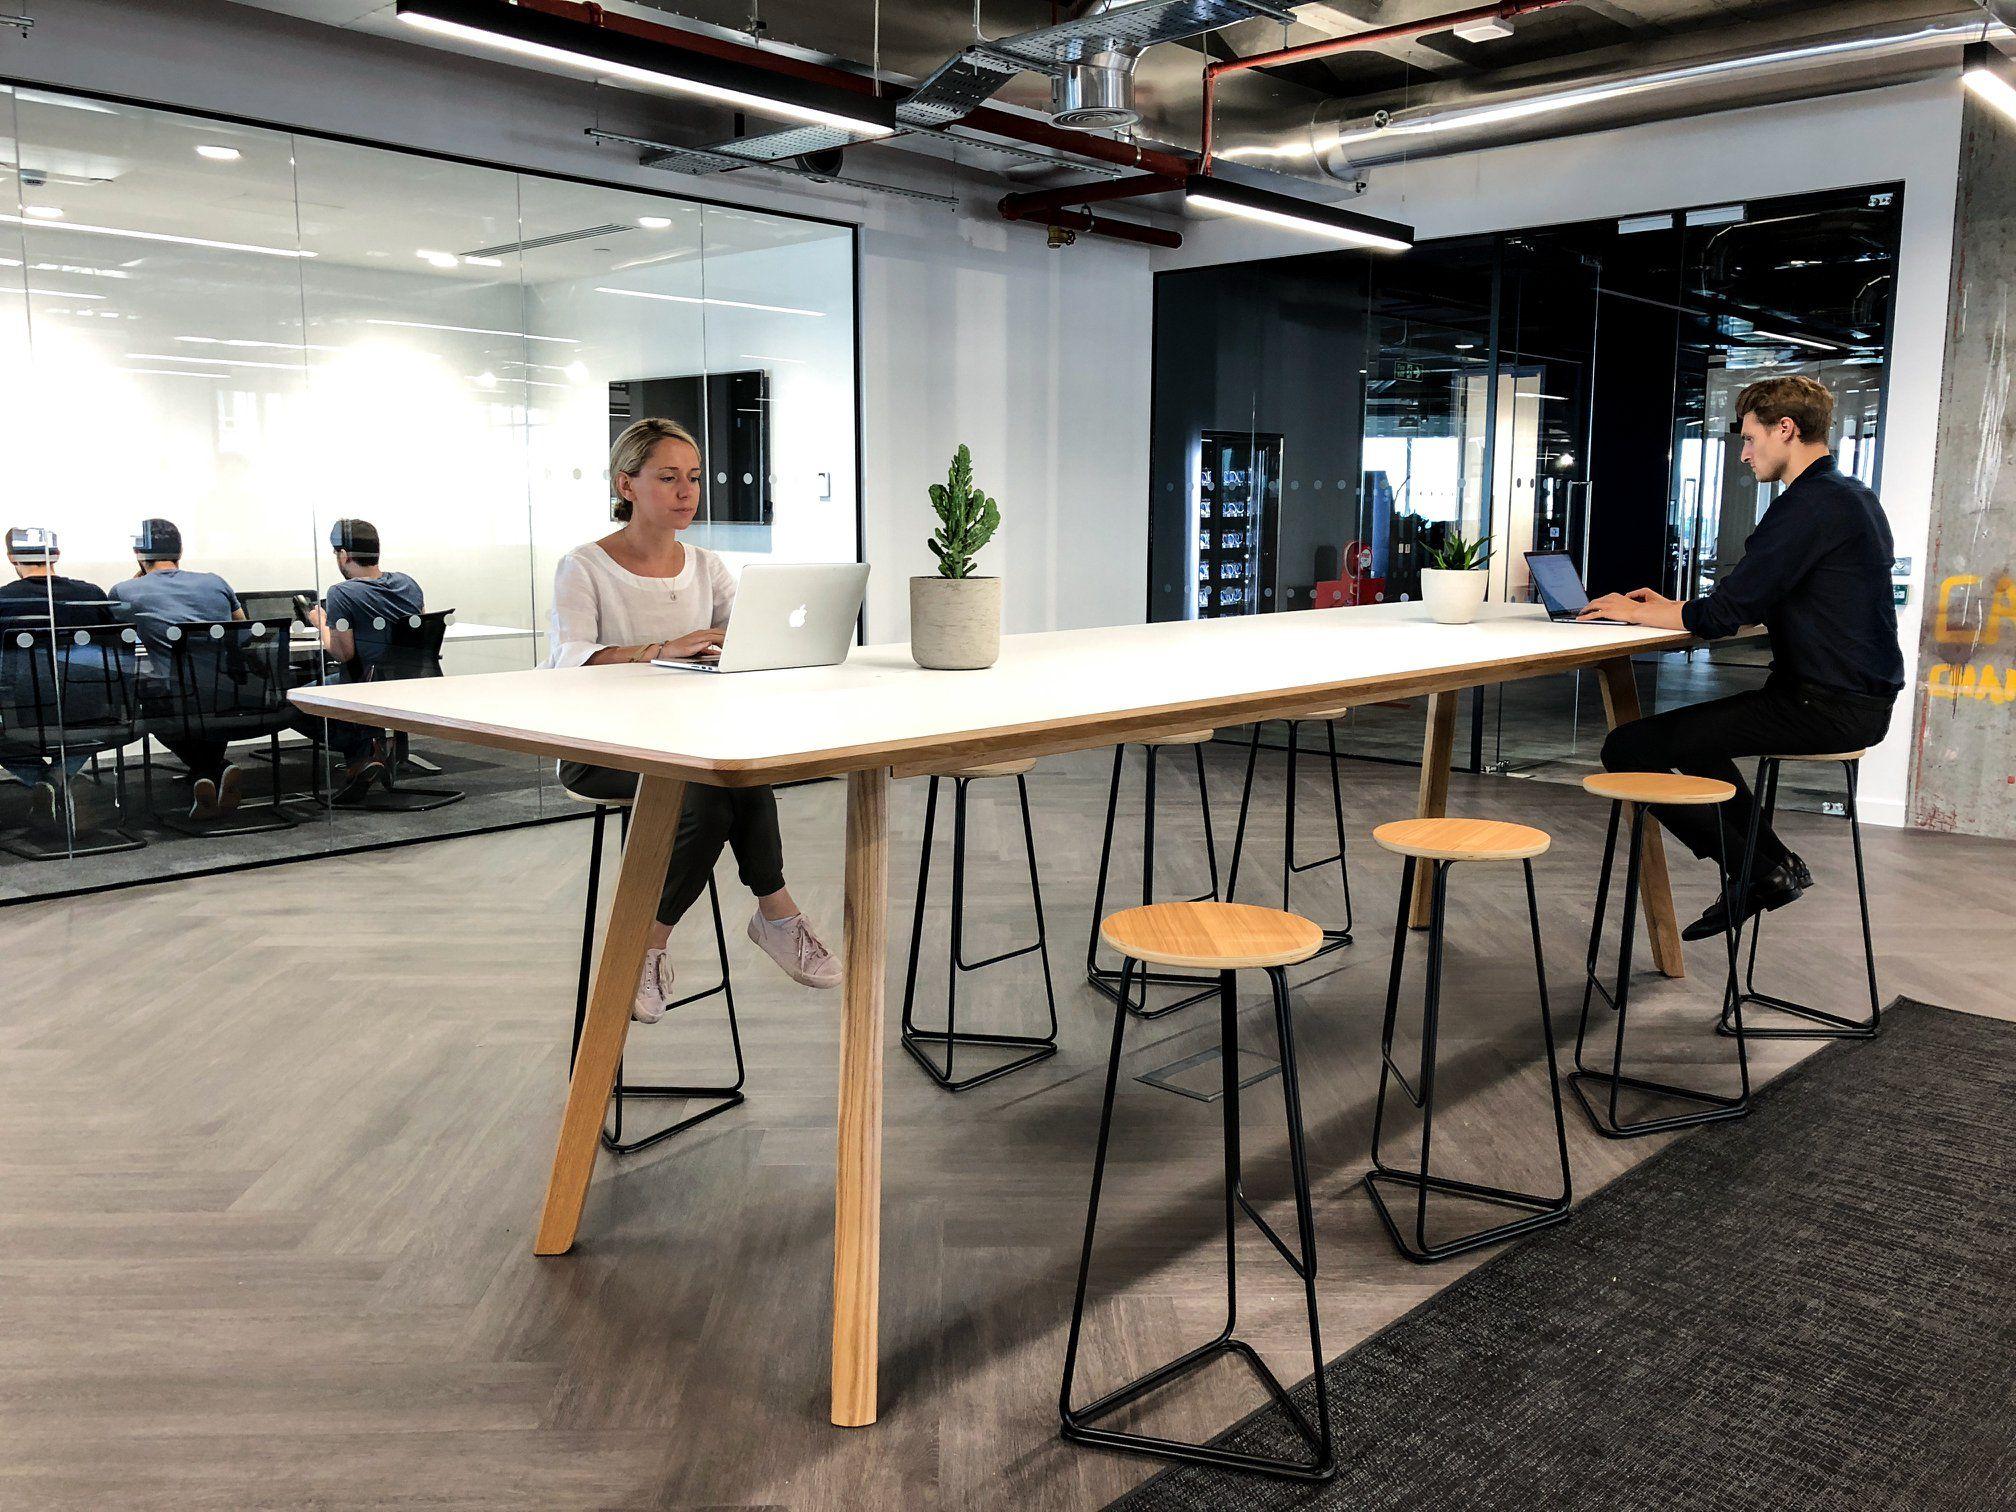 Revolut breakout seating meeting rooms in pinterest